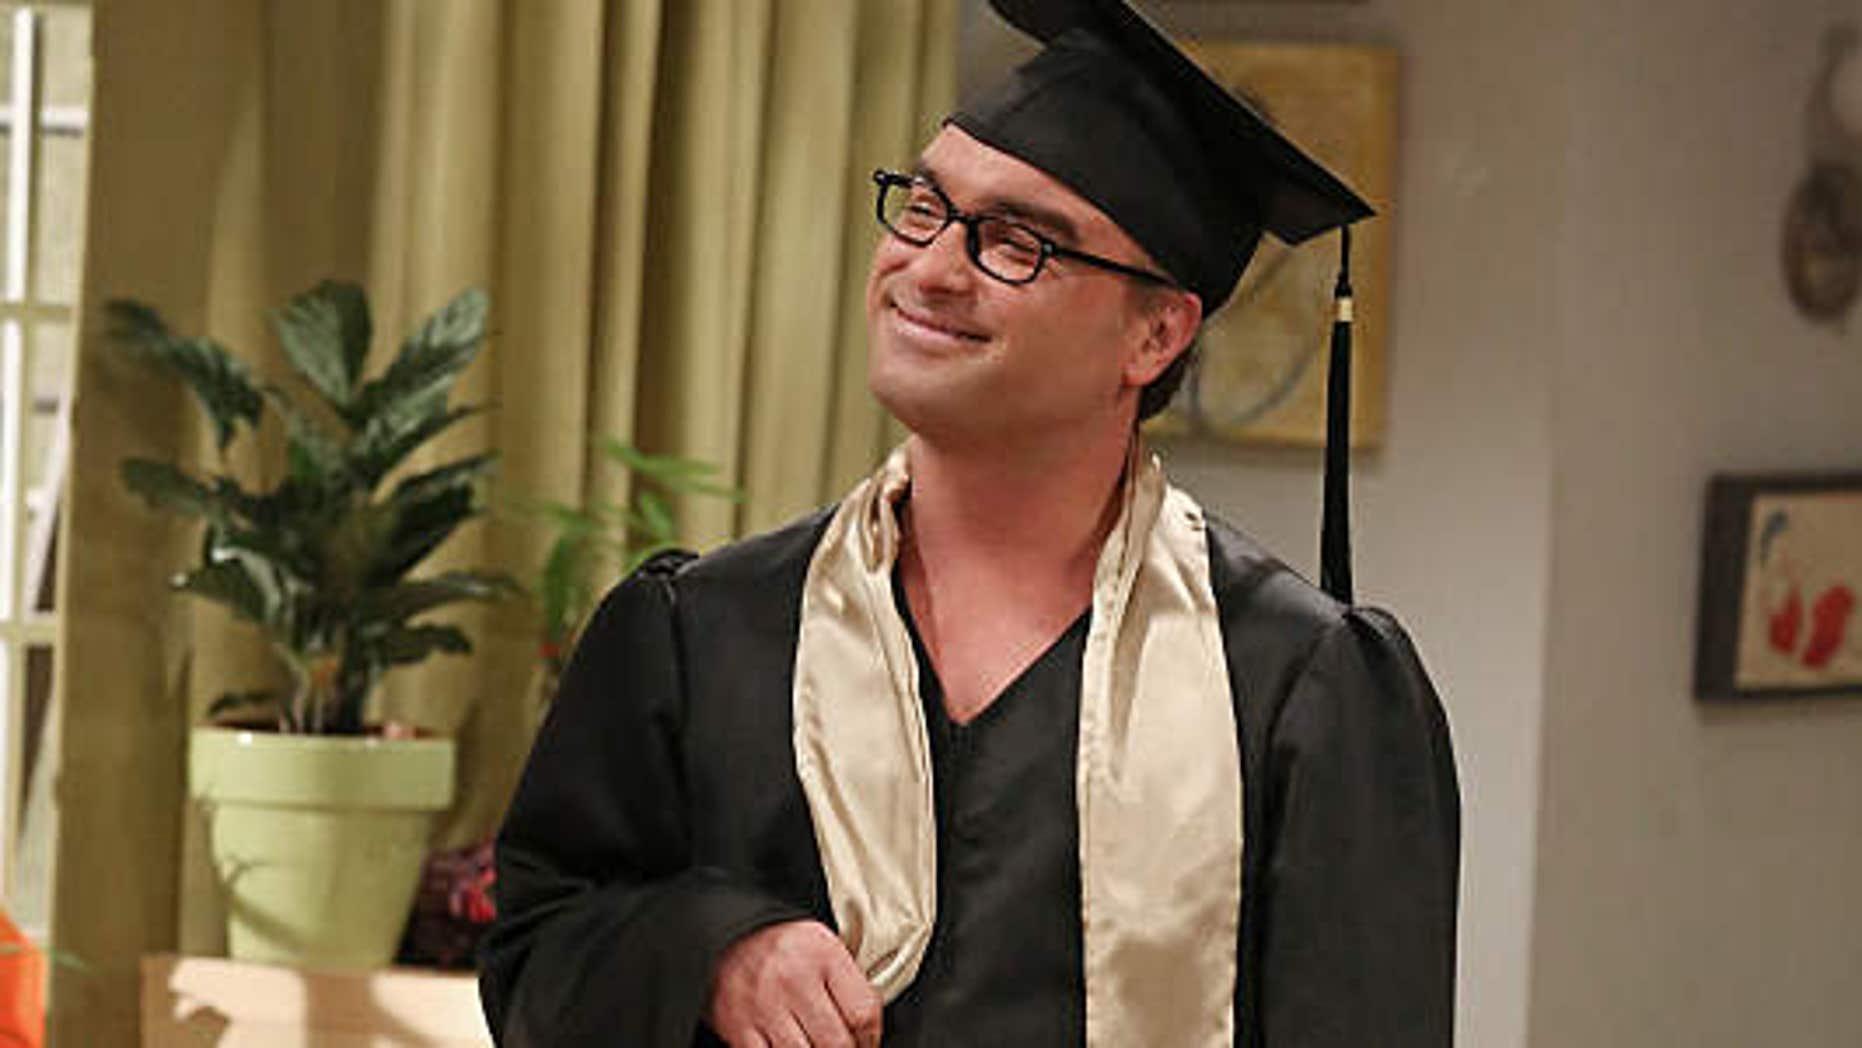 Johnny Galecki plays Leonard on 'The Big Bang Theory' (Neil Jacobs/CBS)